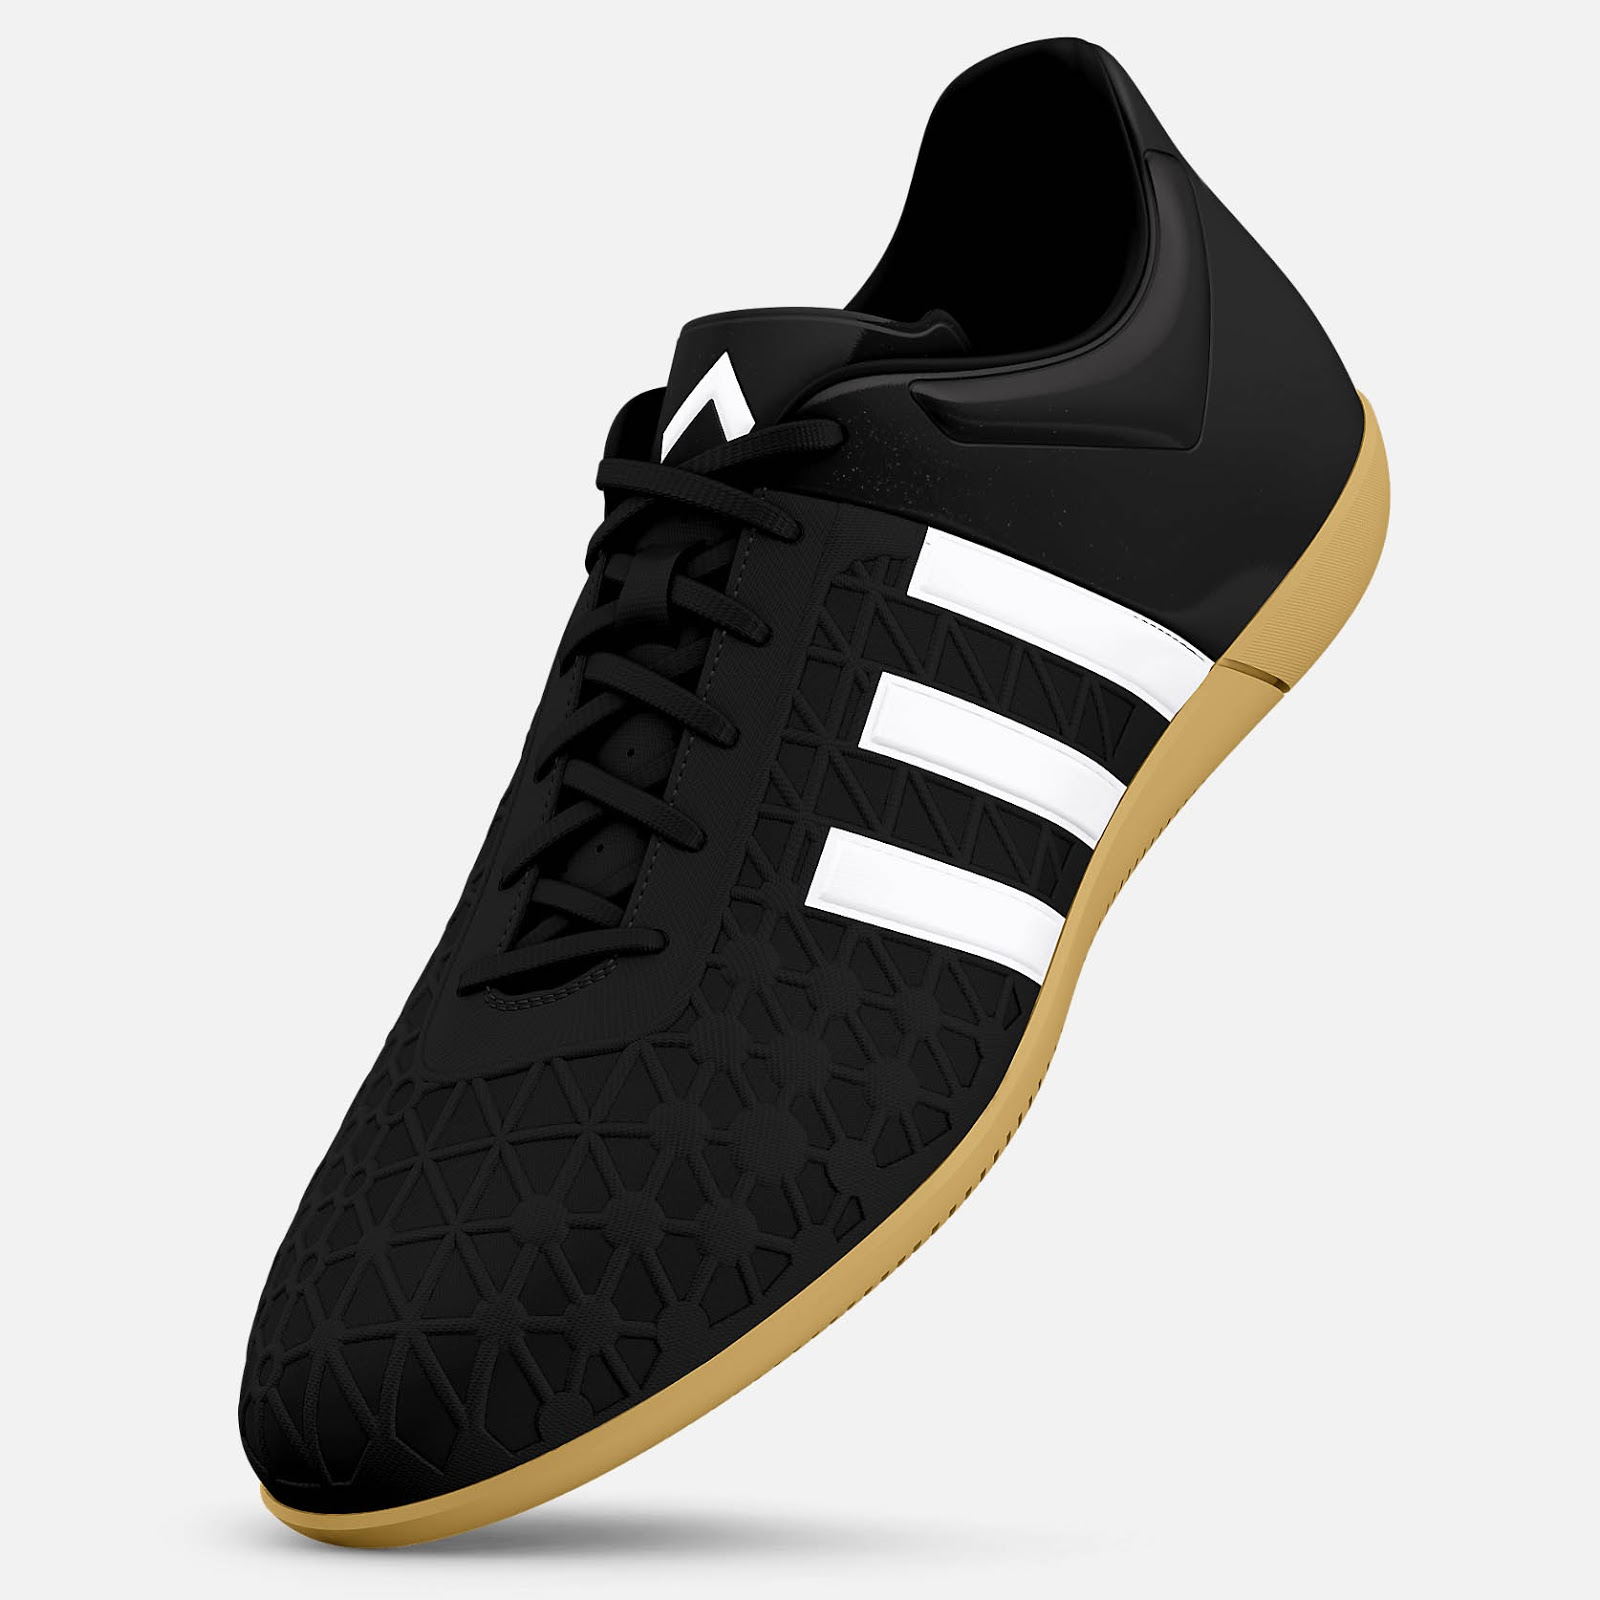 7934ff2989c98 adidas adizero prime - handballschuhe - lab lime/dark blue - neu · kopačky  adidas f50 adizero trx fg junior red